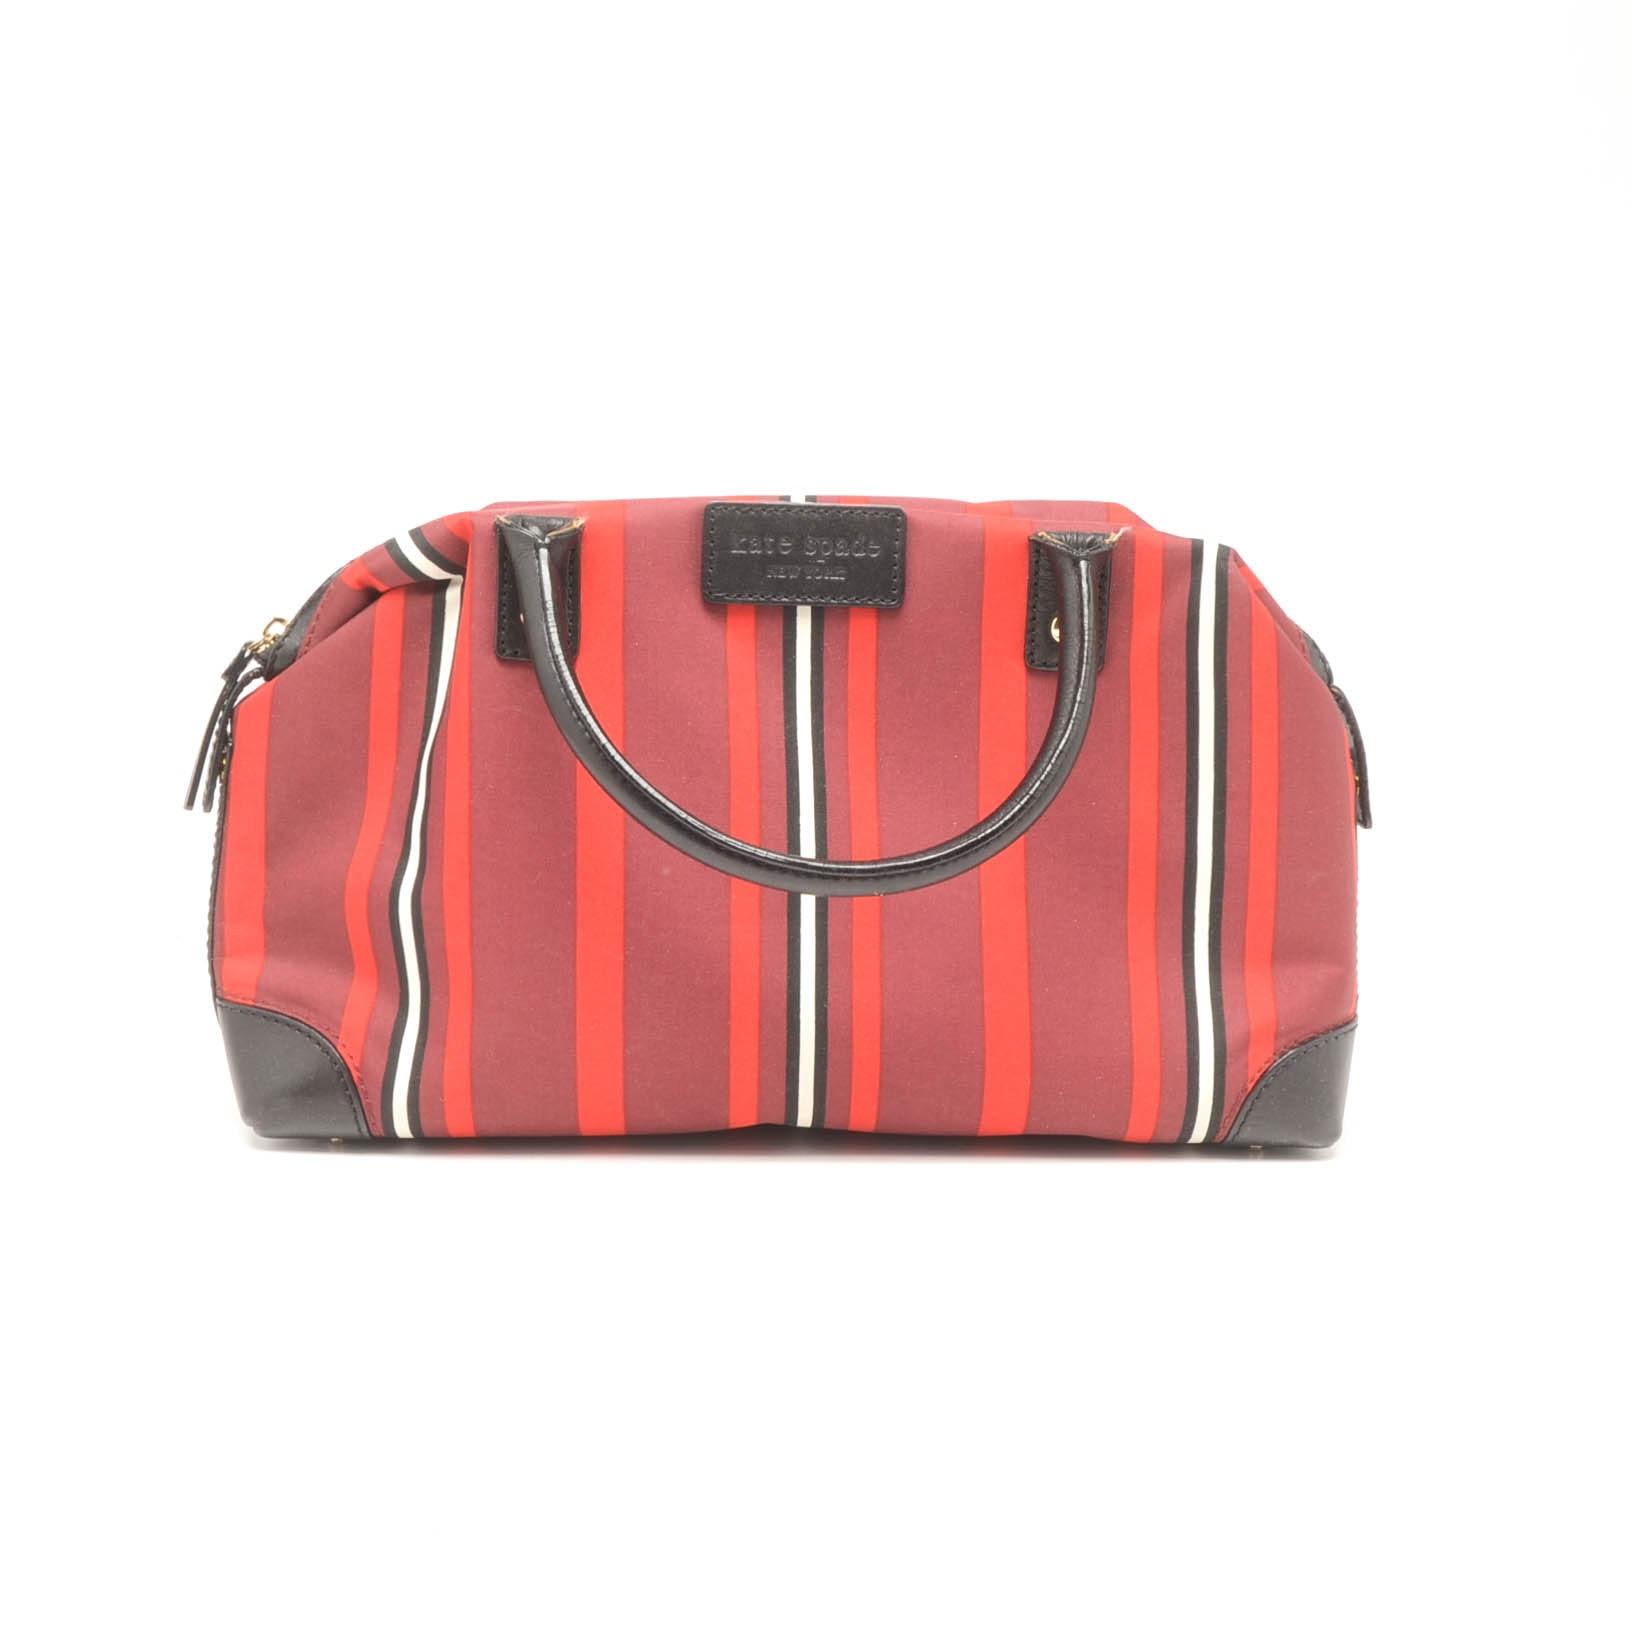 Kate Spade New York Nylon Stripe and Leather Handbag